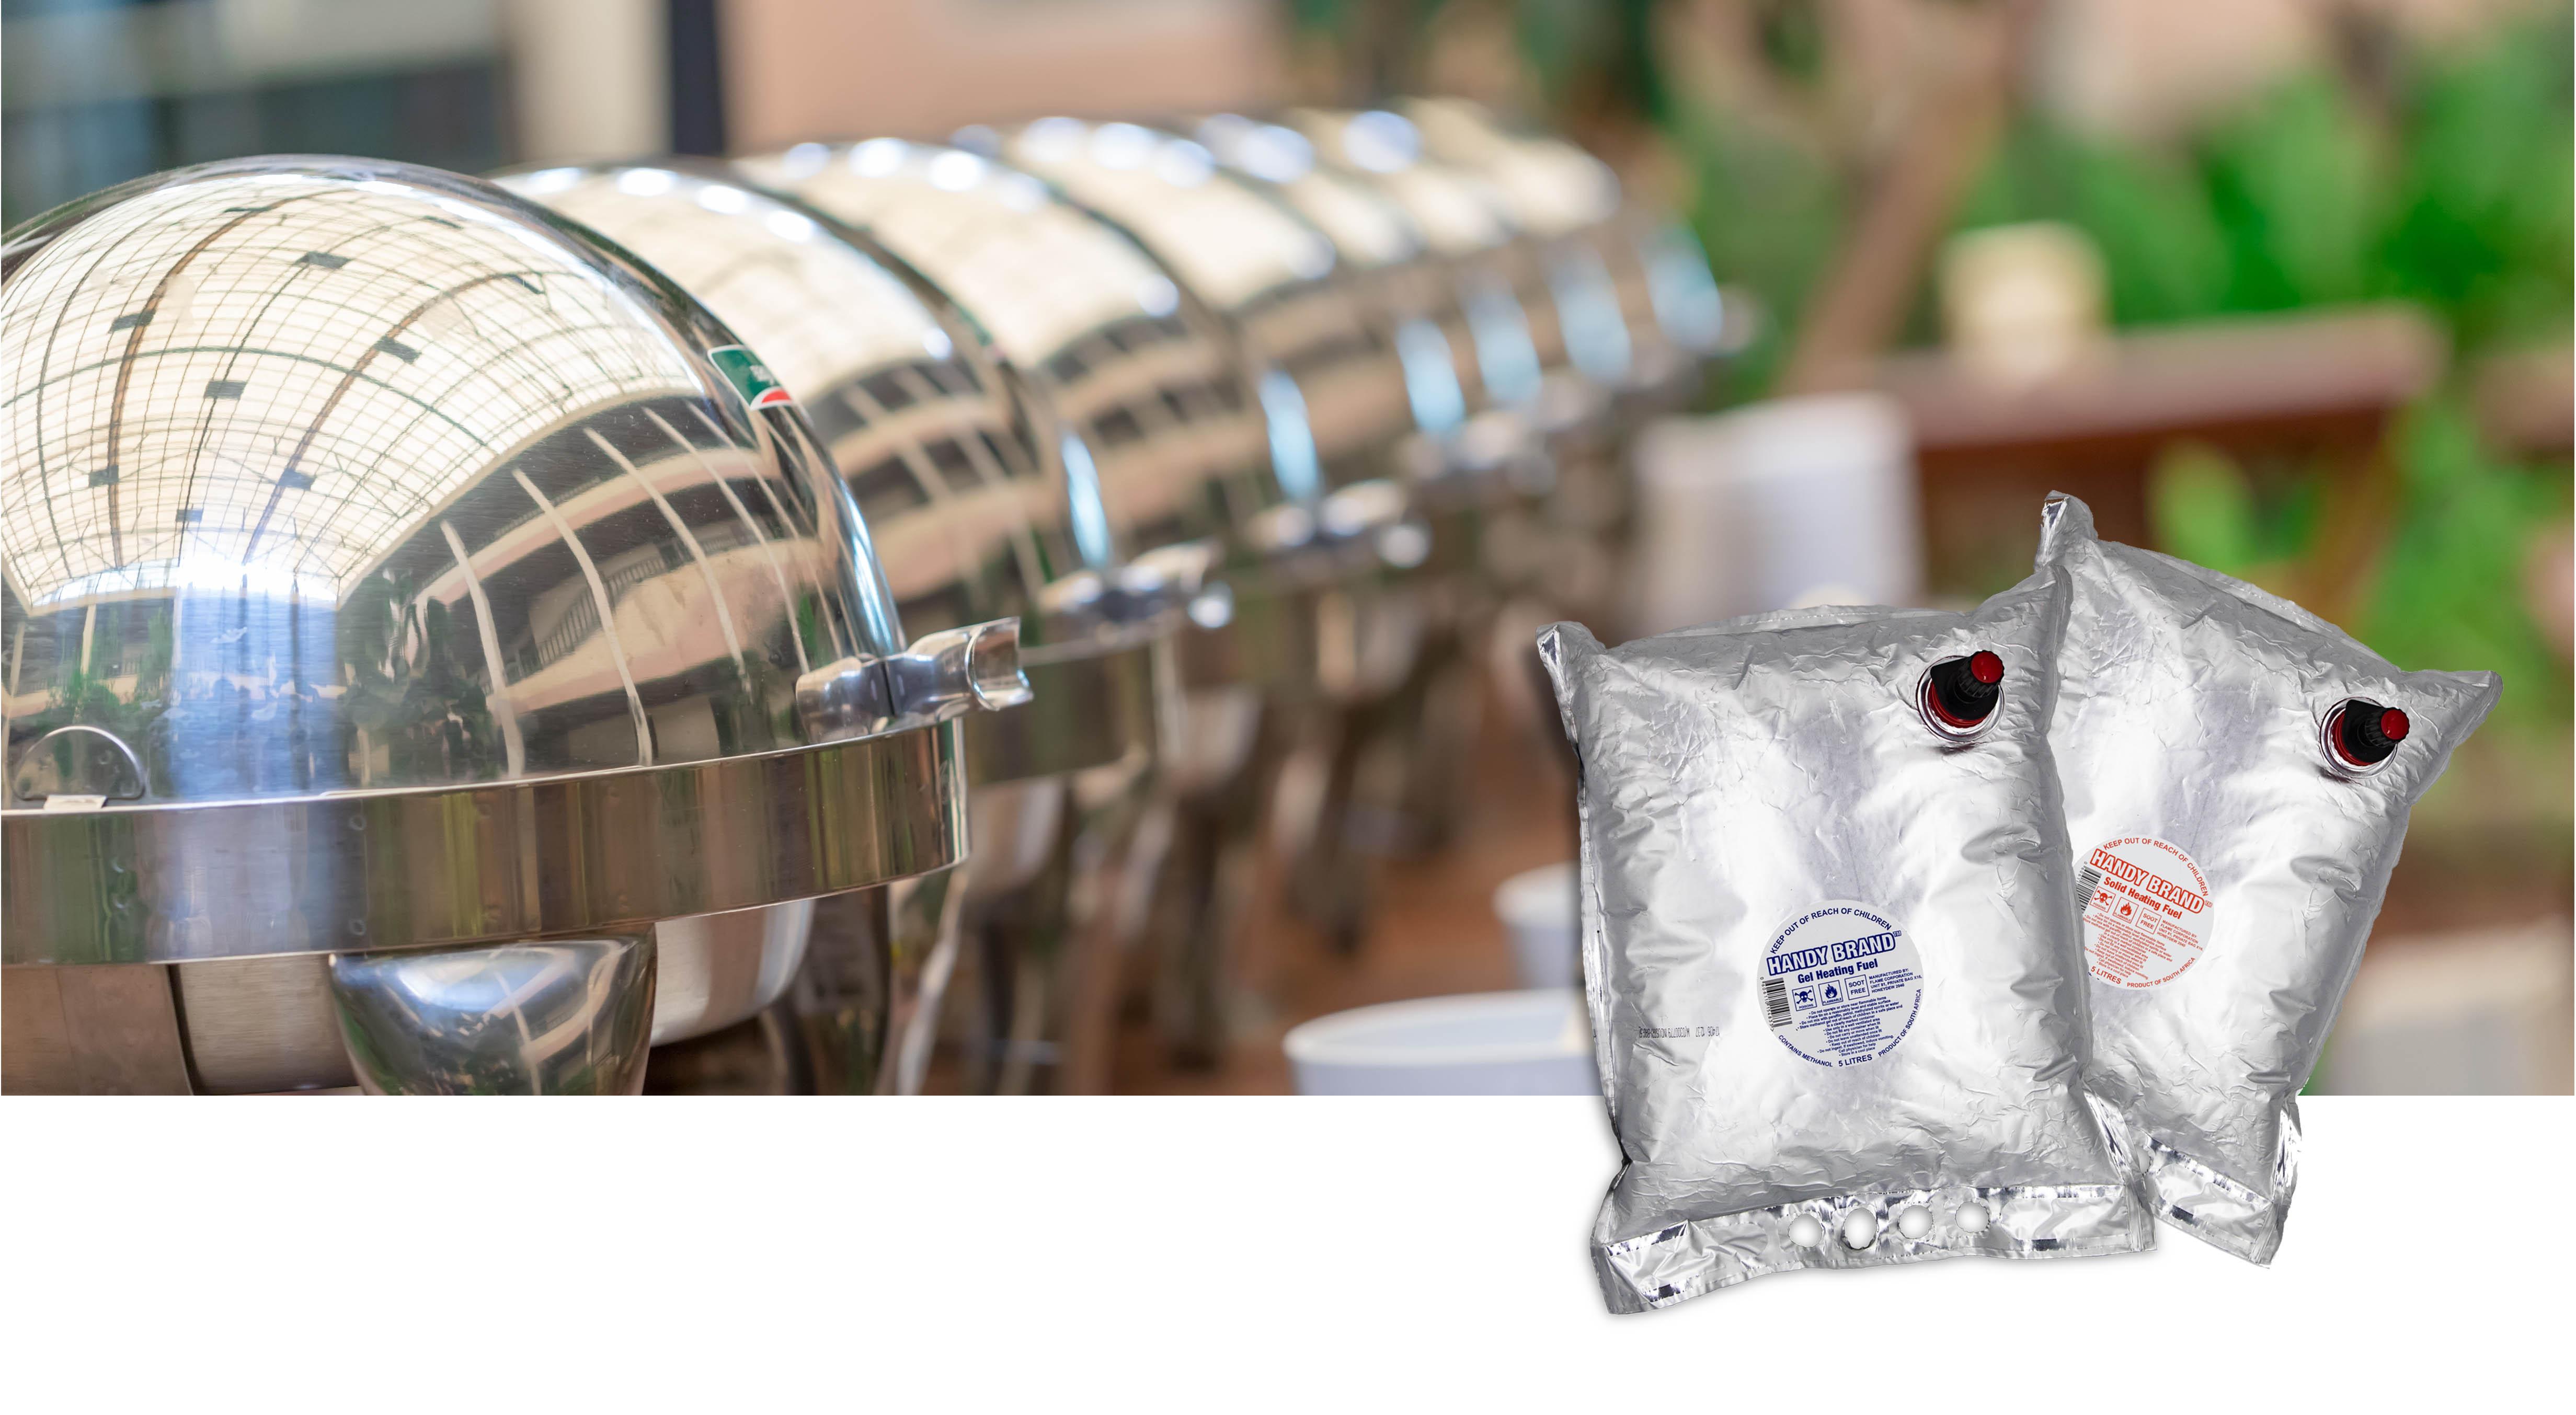 Handy Brand Chafer Refill bags